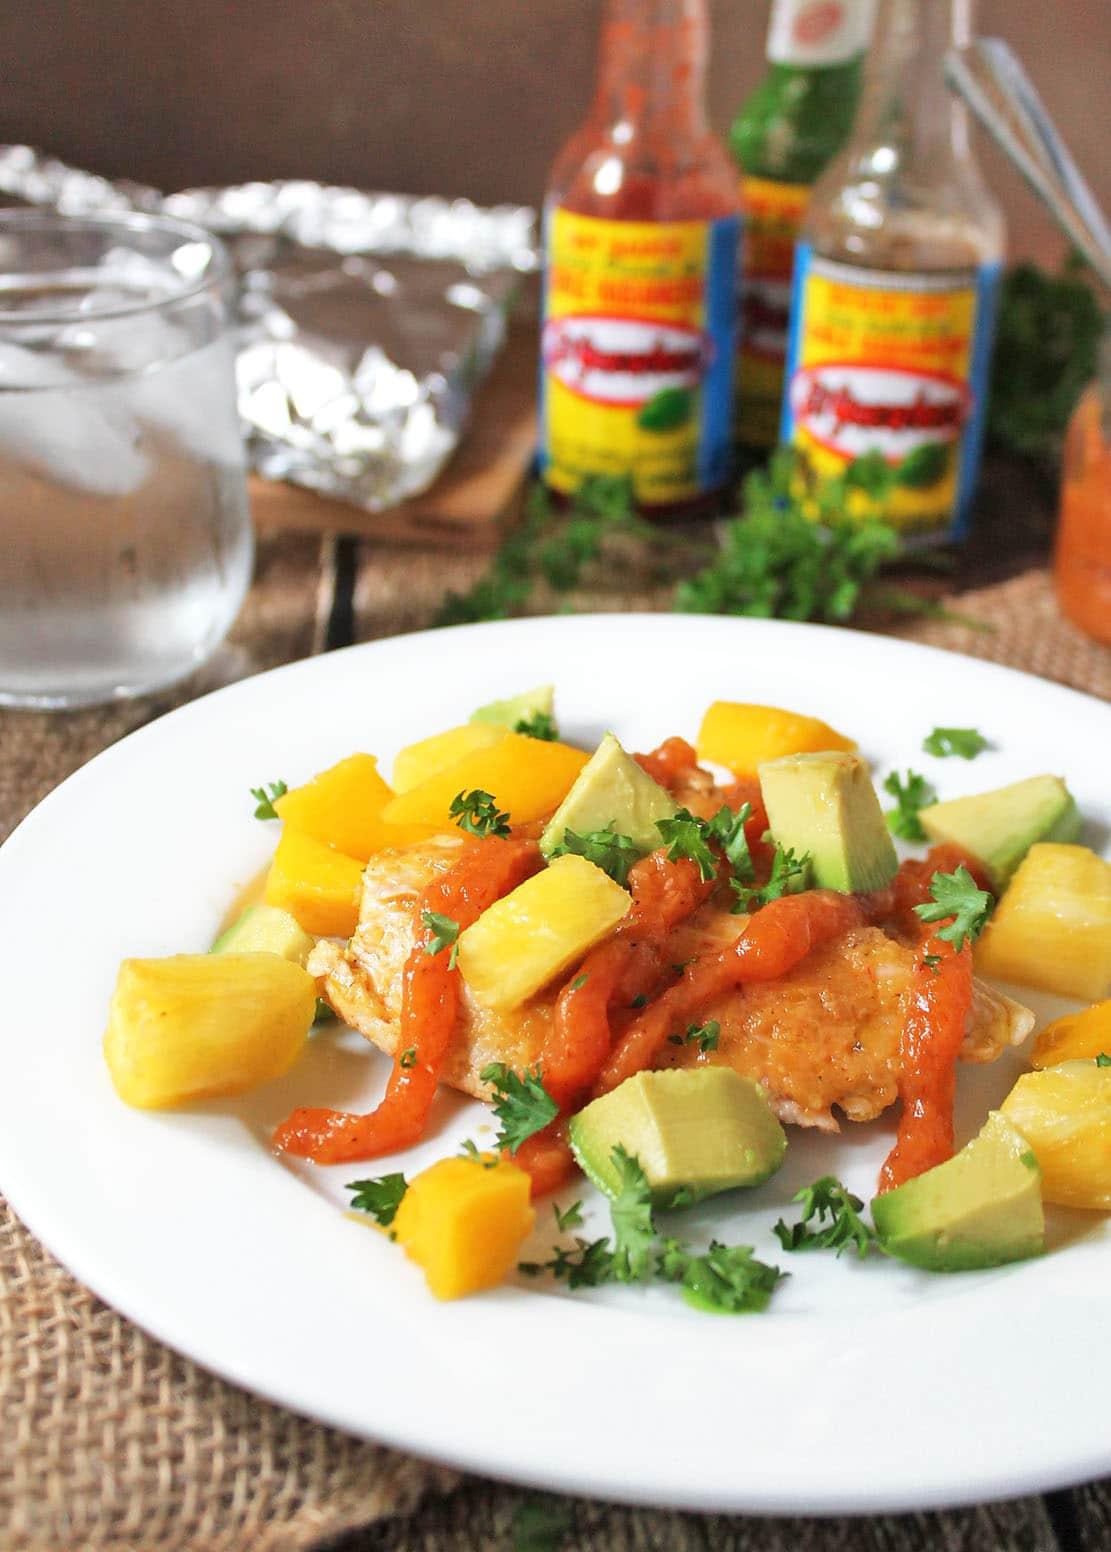 Chicken-With-Spicy-Pineapple-Mango-Sauce-#KingOfFlavor